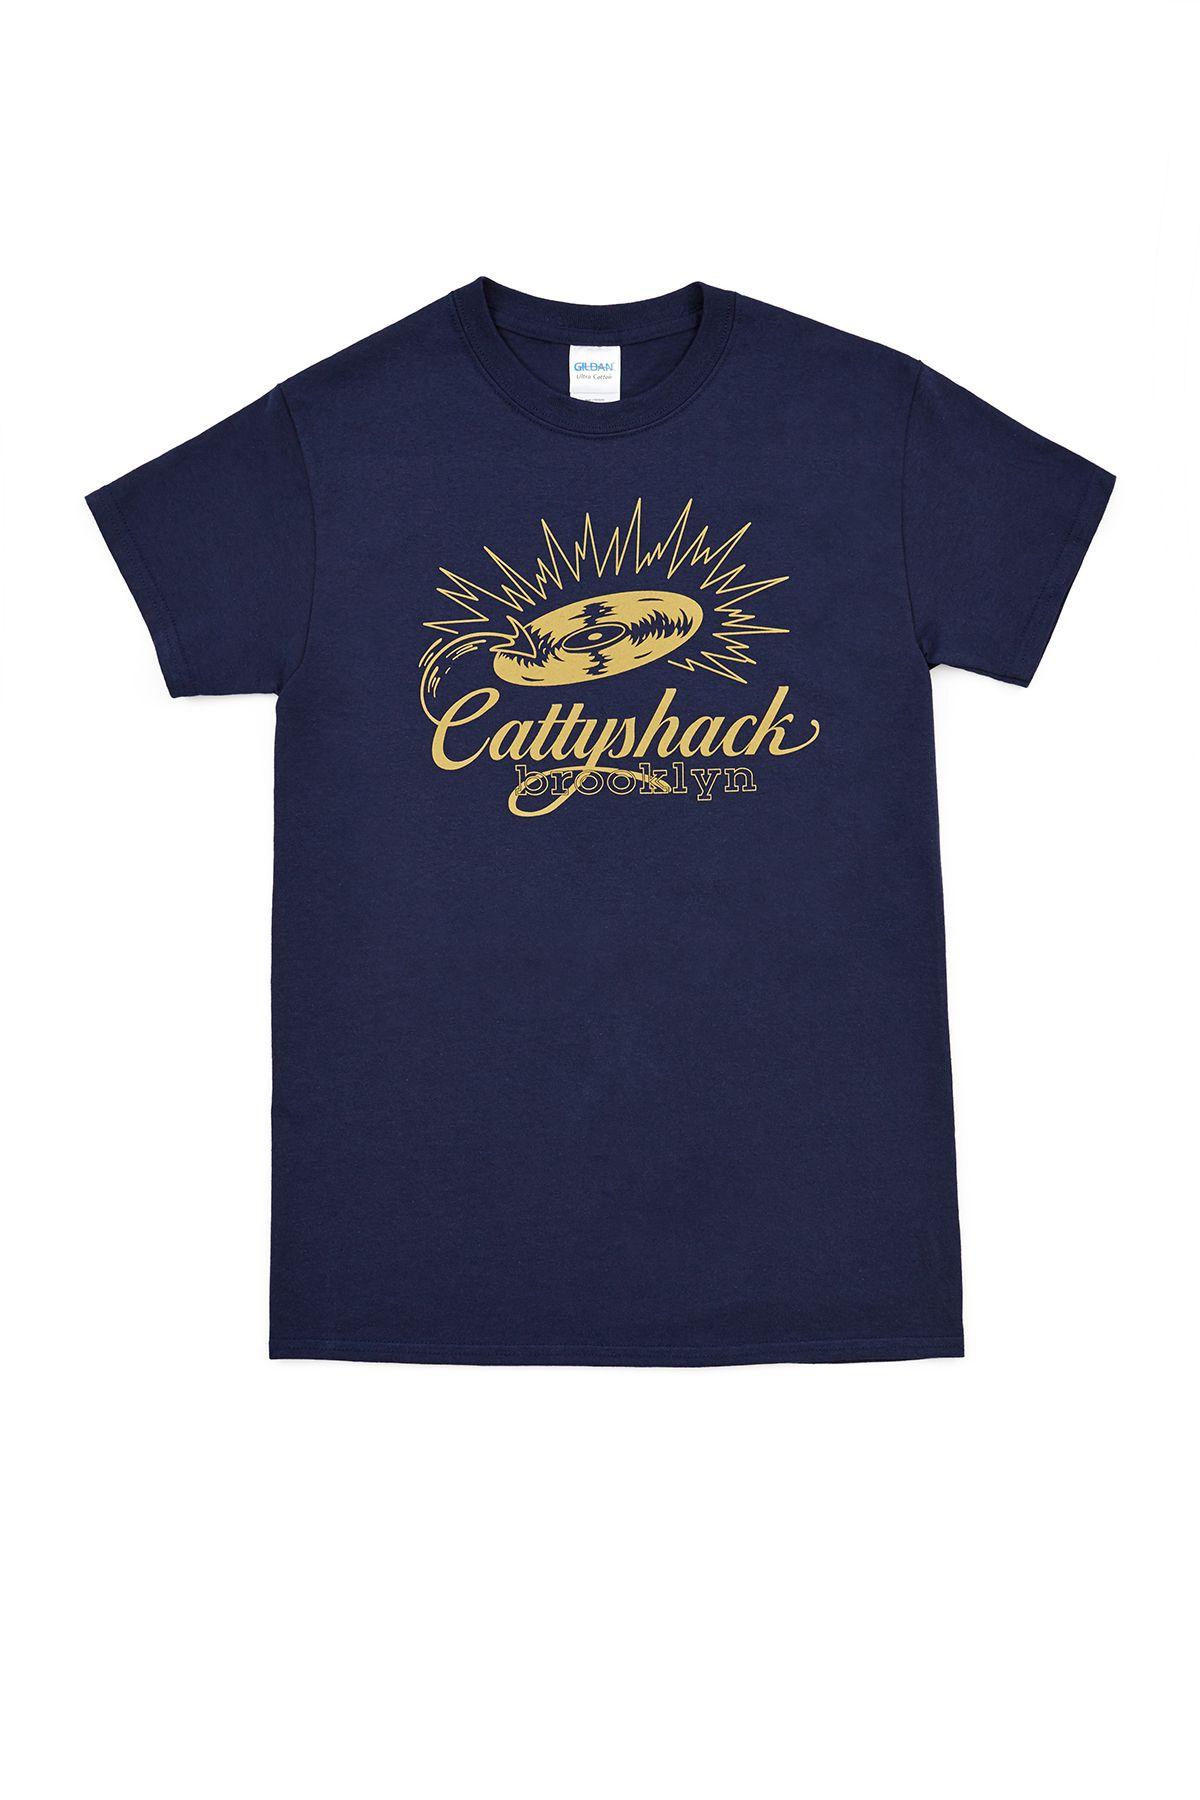 Navy T-shirt for the Cattyshack bar